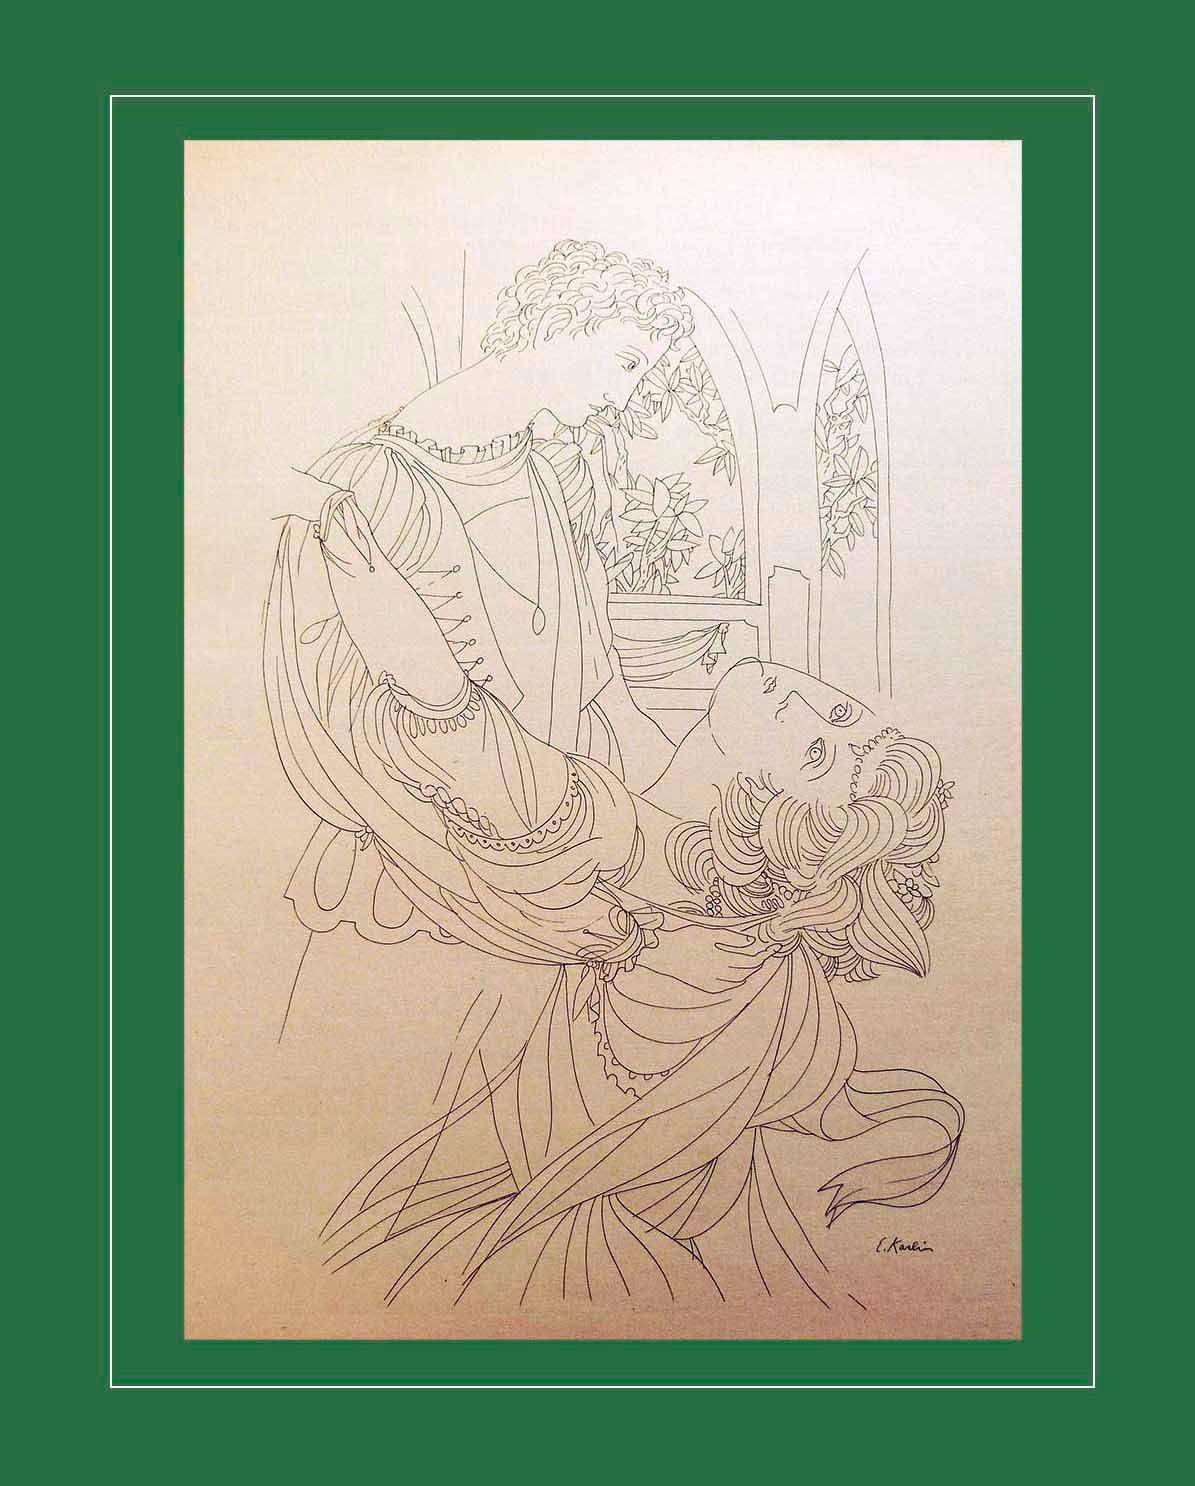 Shakespeare's Romeo & Juliet Modernist Line Drawing by Eugene Karin 1957 Large 1 - $24.99